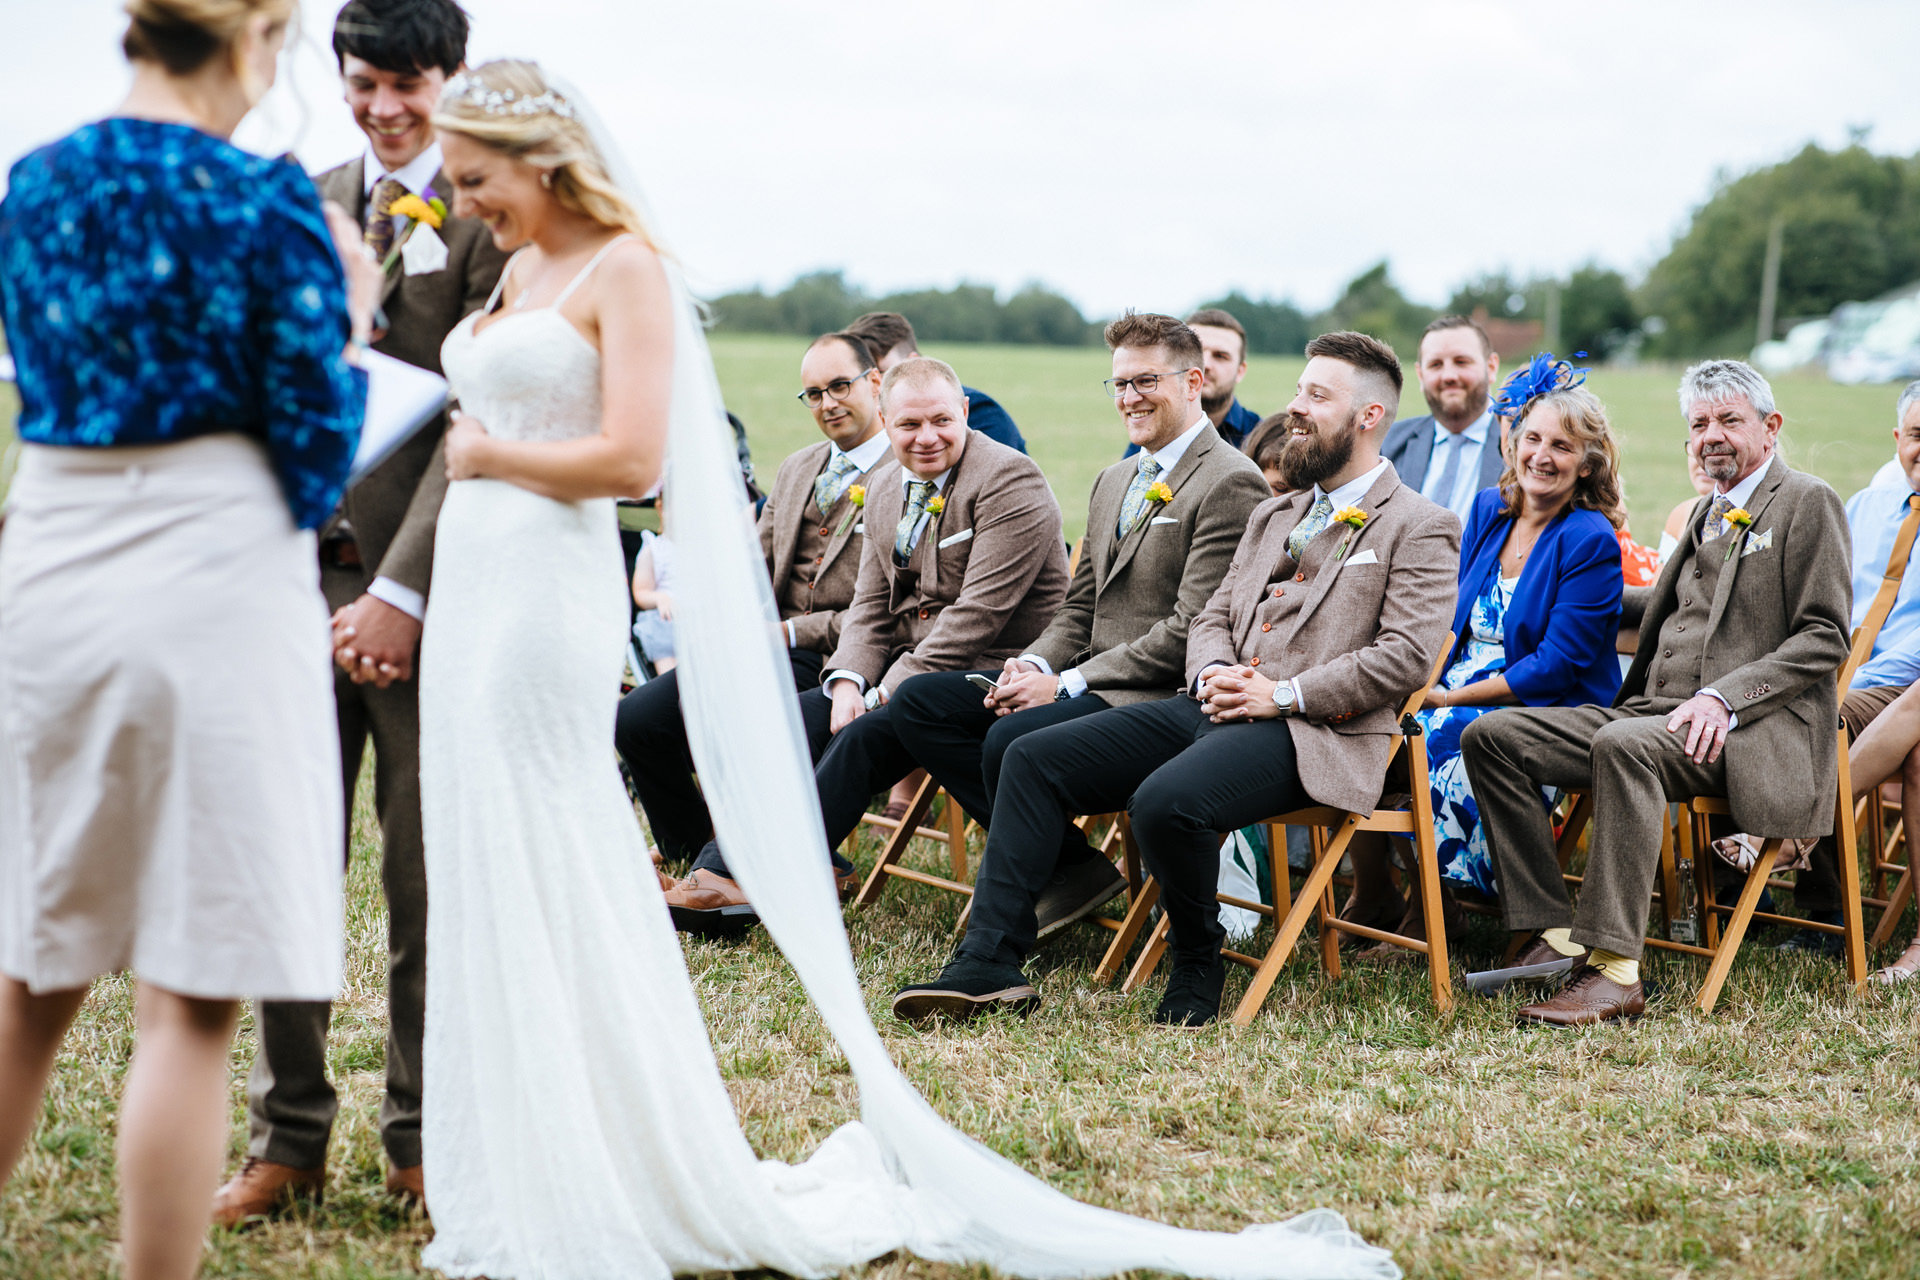 groomsmen in tweed watching the wedding ceremony and smiling